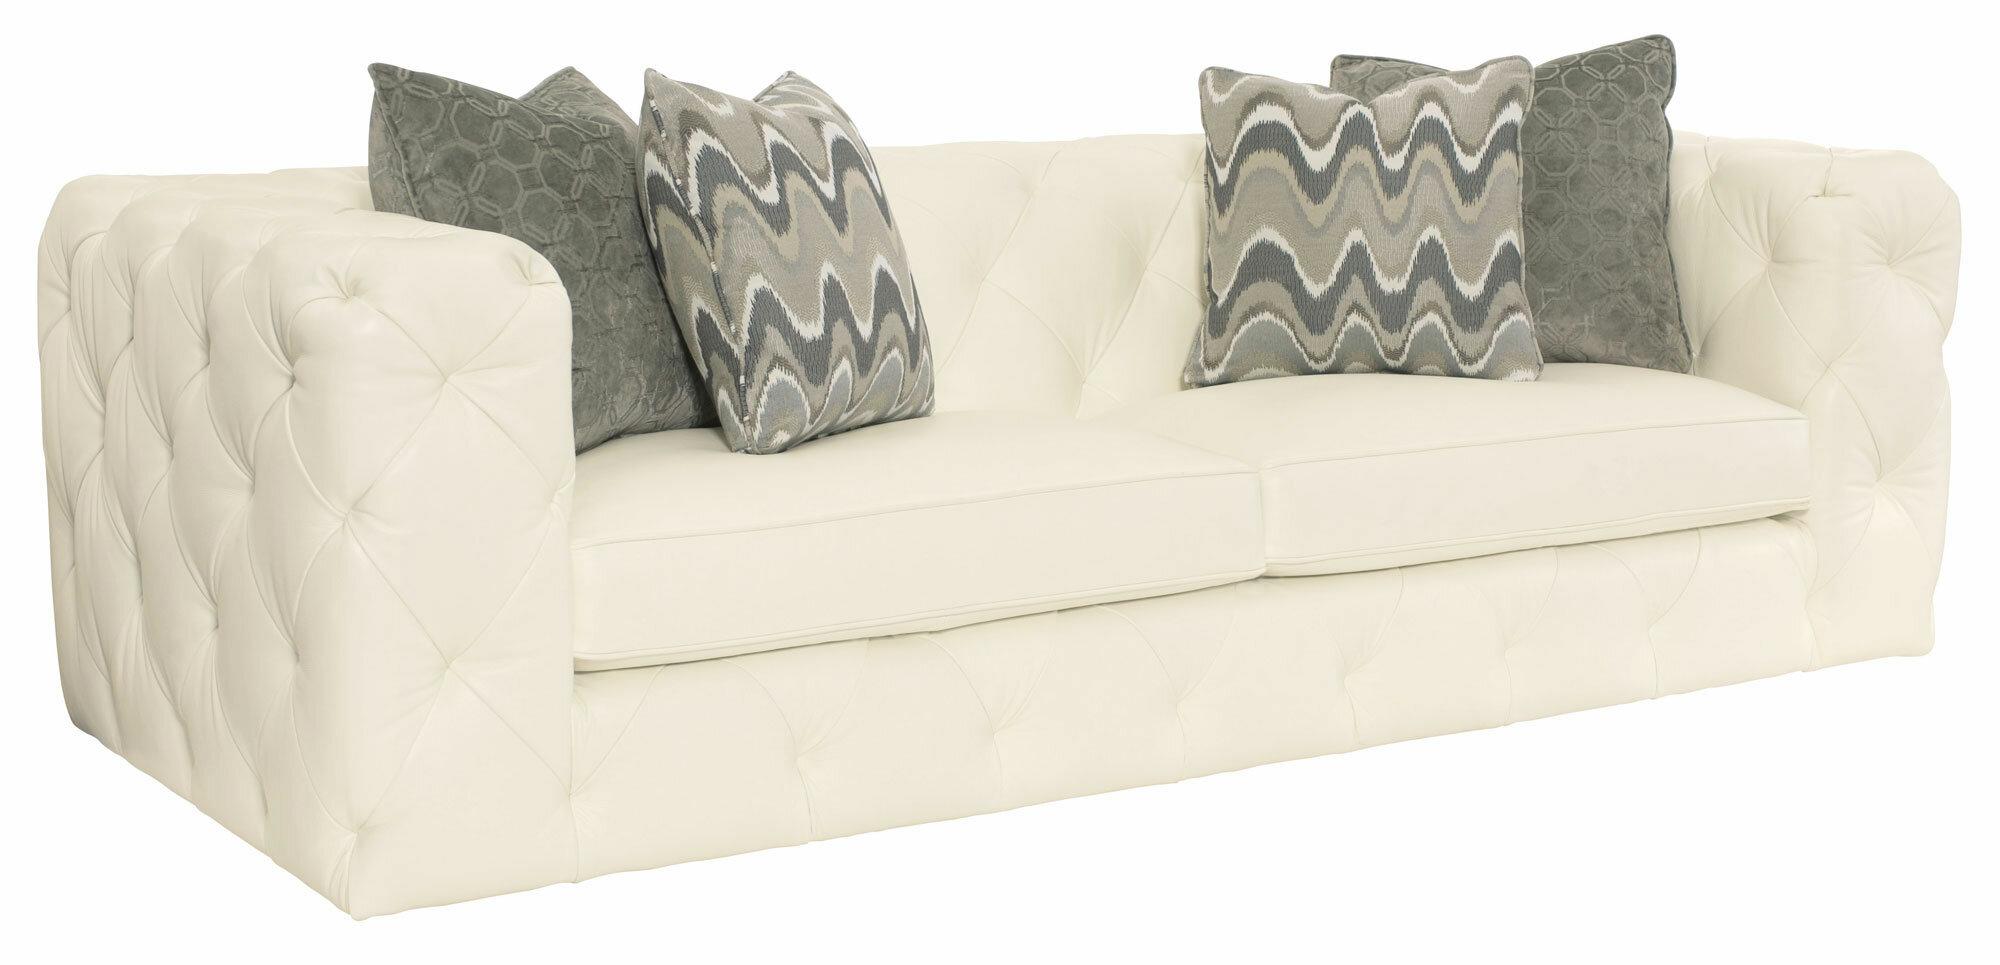 Peachy Chelsea Leather Sofa Home Interior And Landscaping Eliaenasavecom